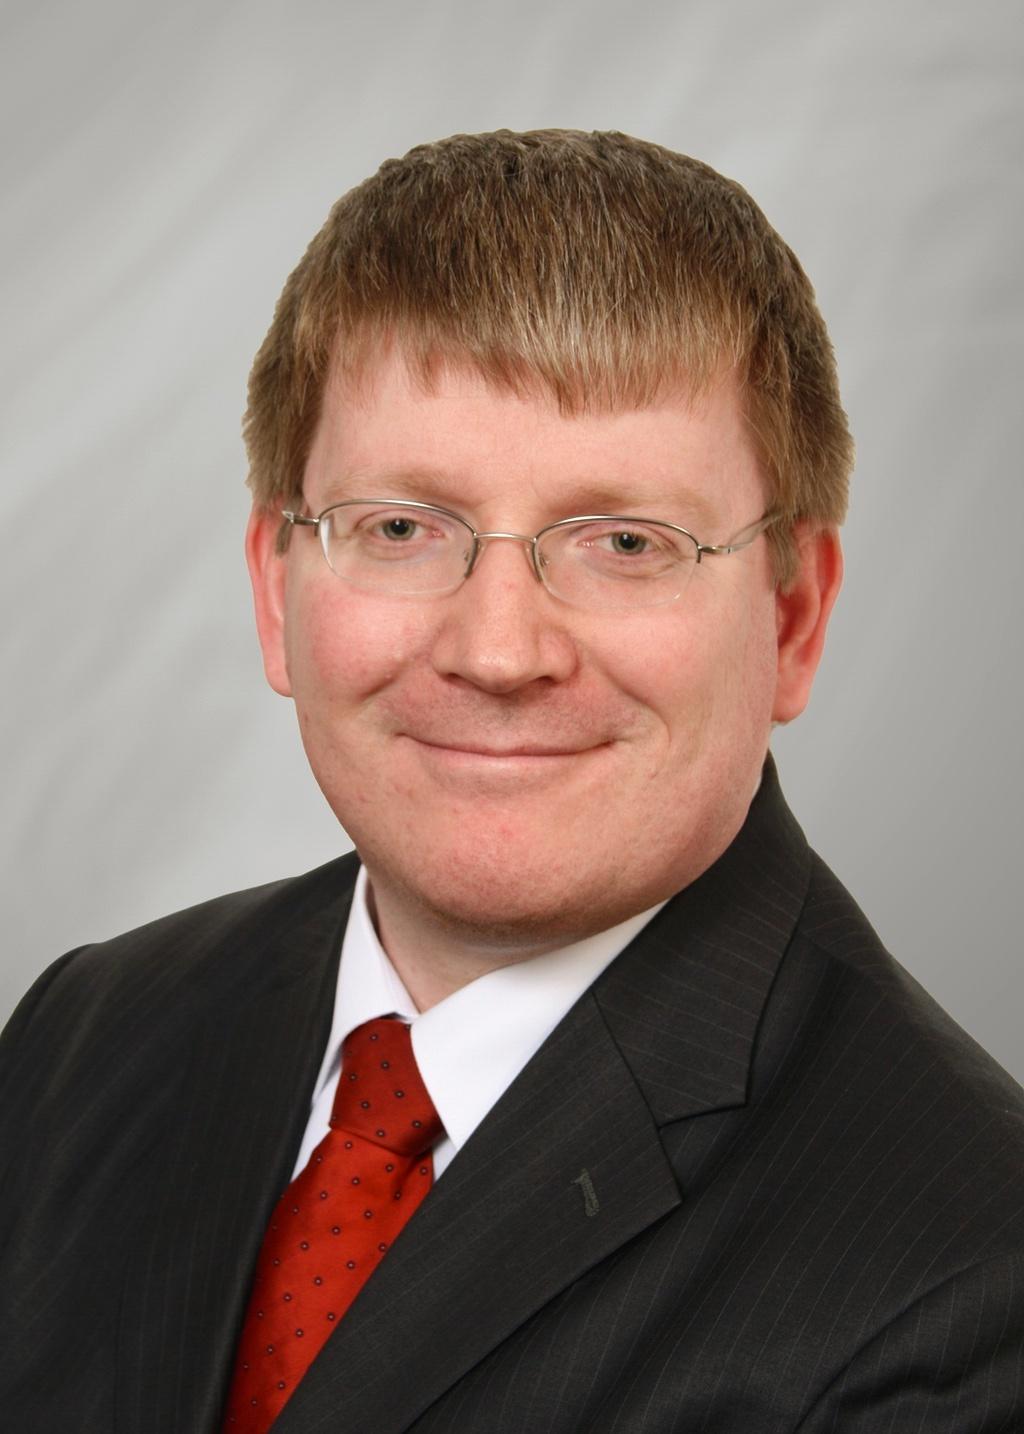 Tobias Jünemann